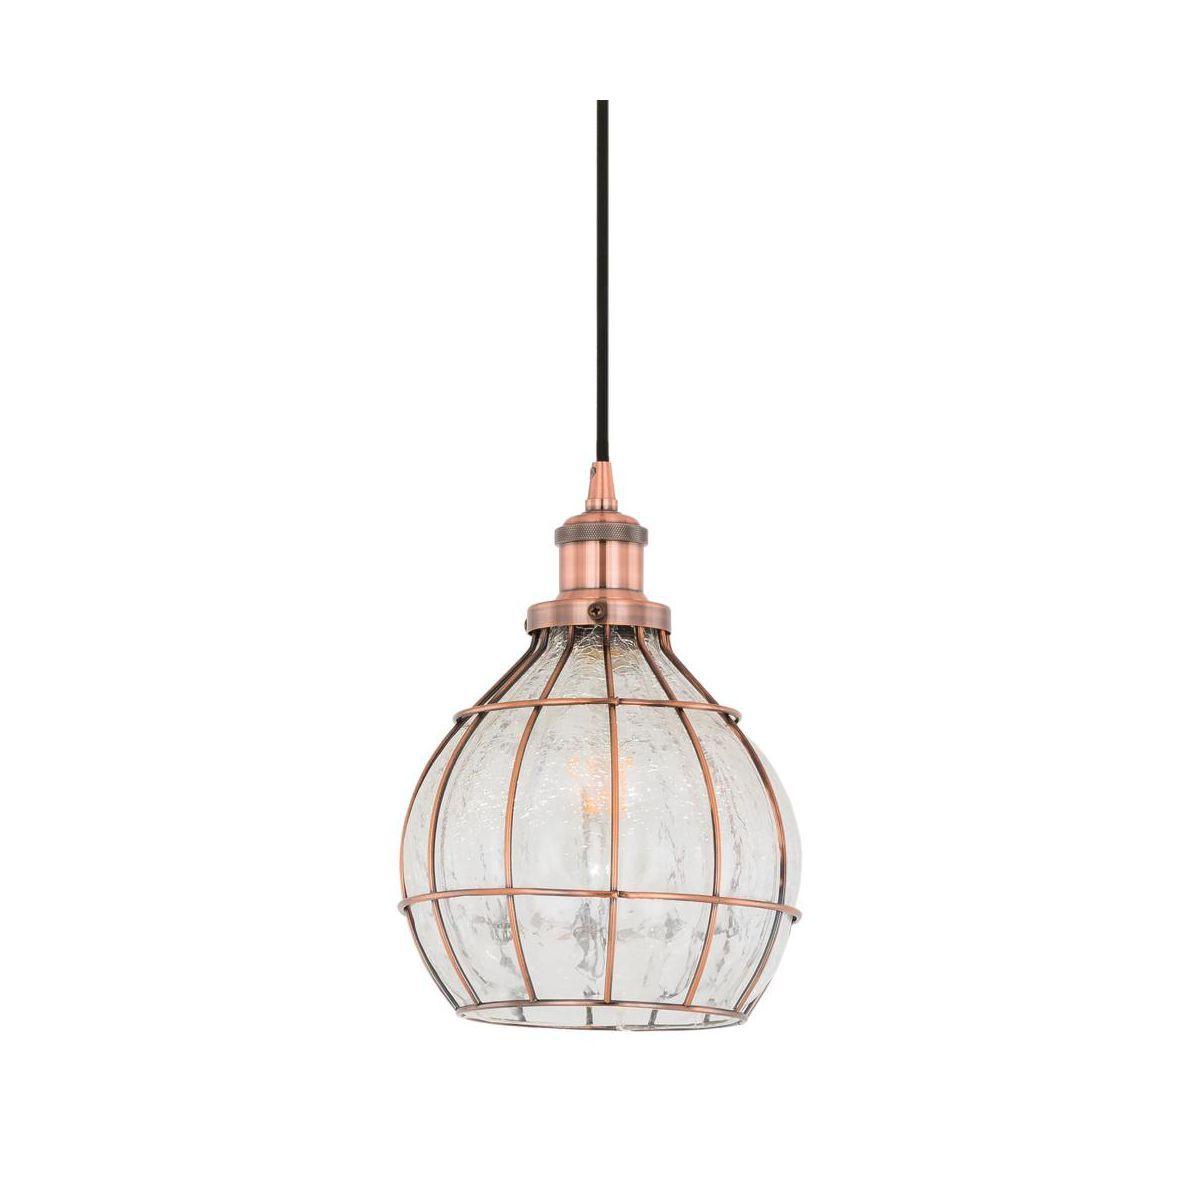 Lampa Wisząca Finter Italux Lampy Sufitowe żyrandole